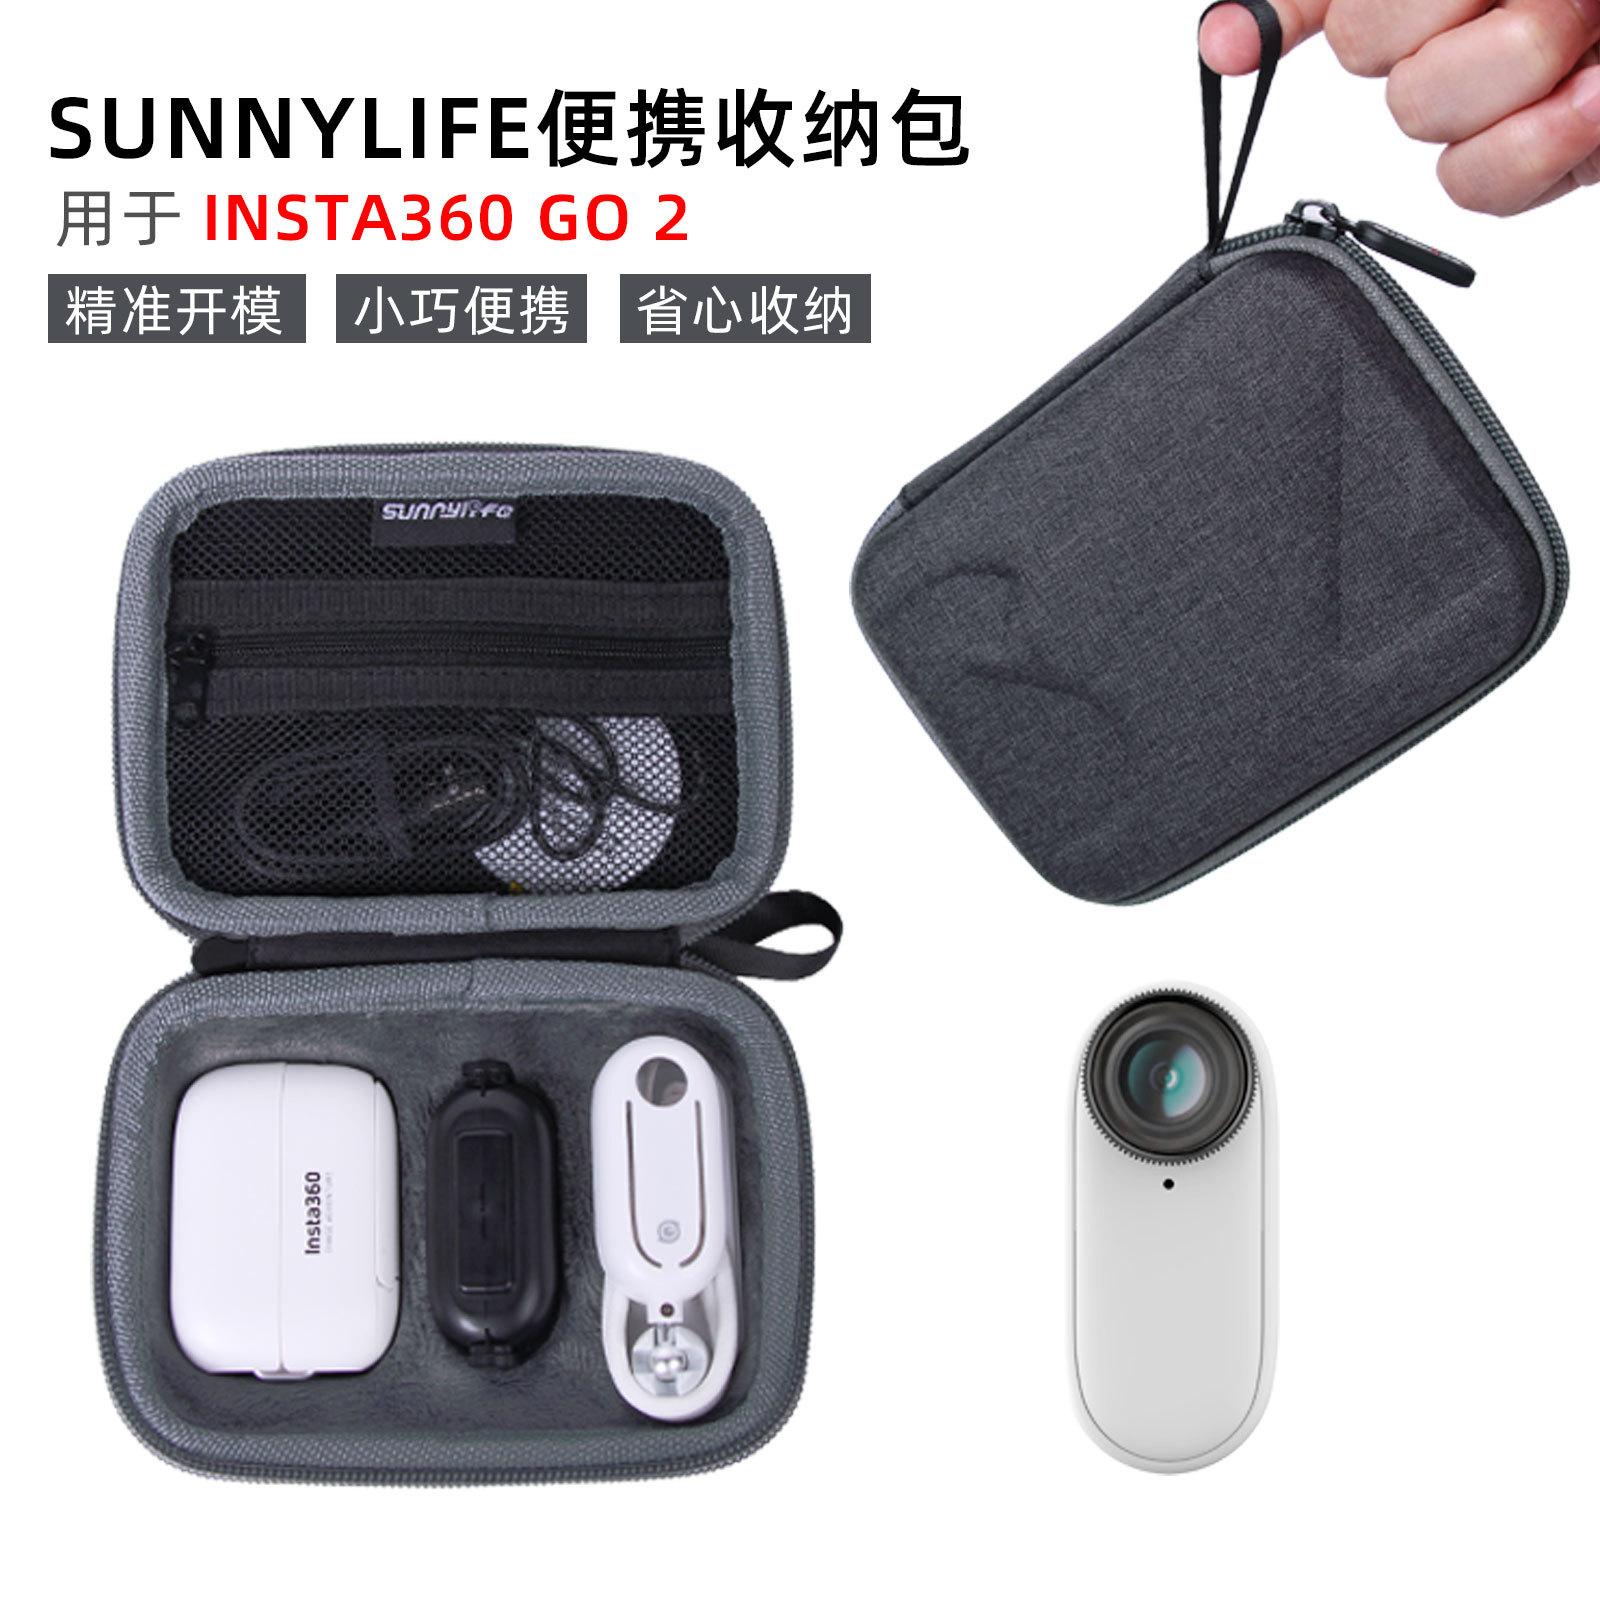 Sunnylife 適用於Insta360 go套裝收納包 Insta360 go拇指防抖相機收納包